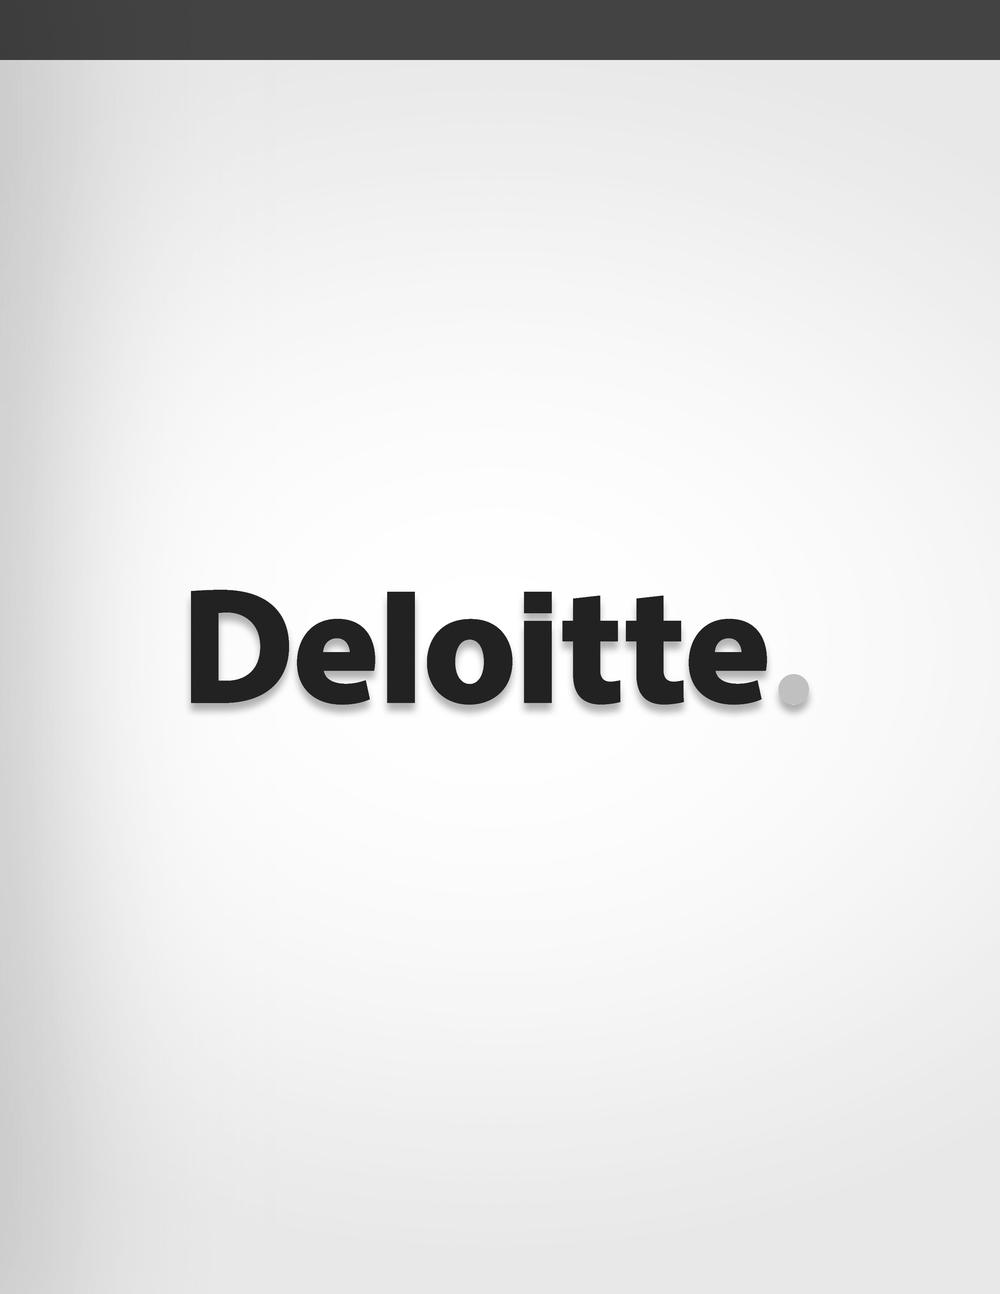 M&A Trends Report  (Deloitte)